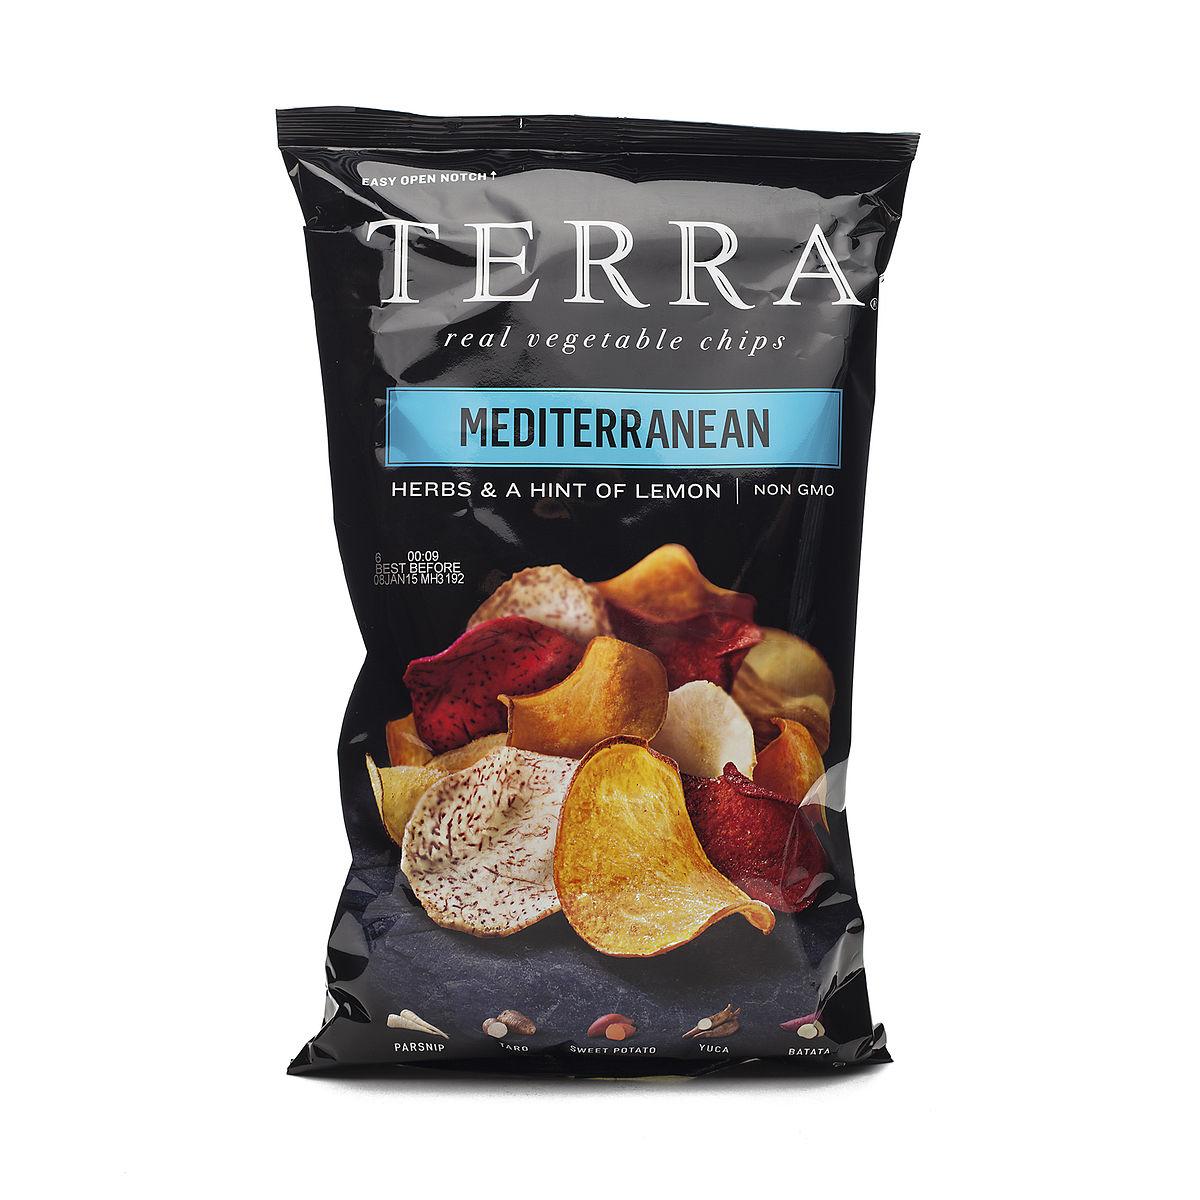 Terra Chips Exotic Vegetable Chips Mediterranean